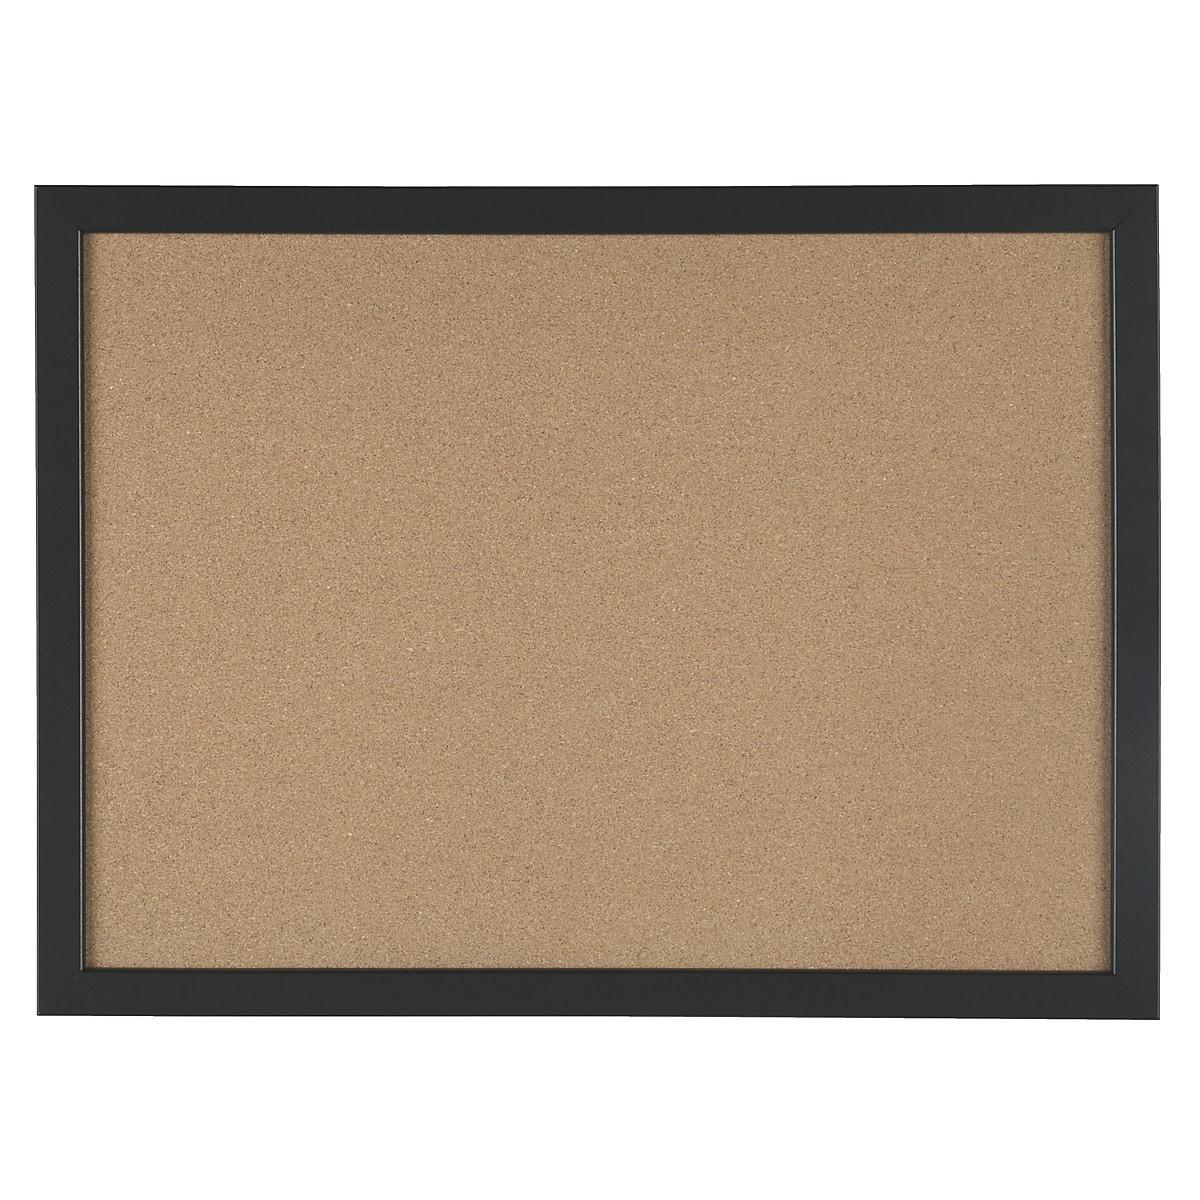 Anslagstavla kork 585 x 43 cm